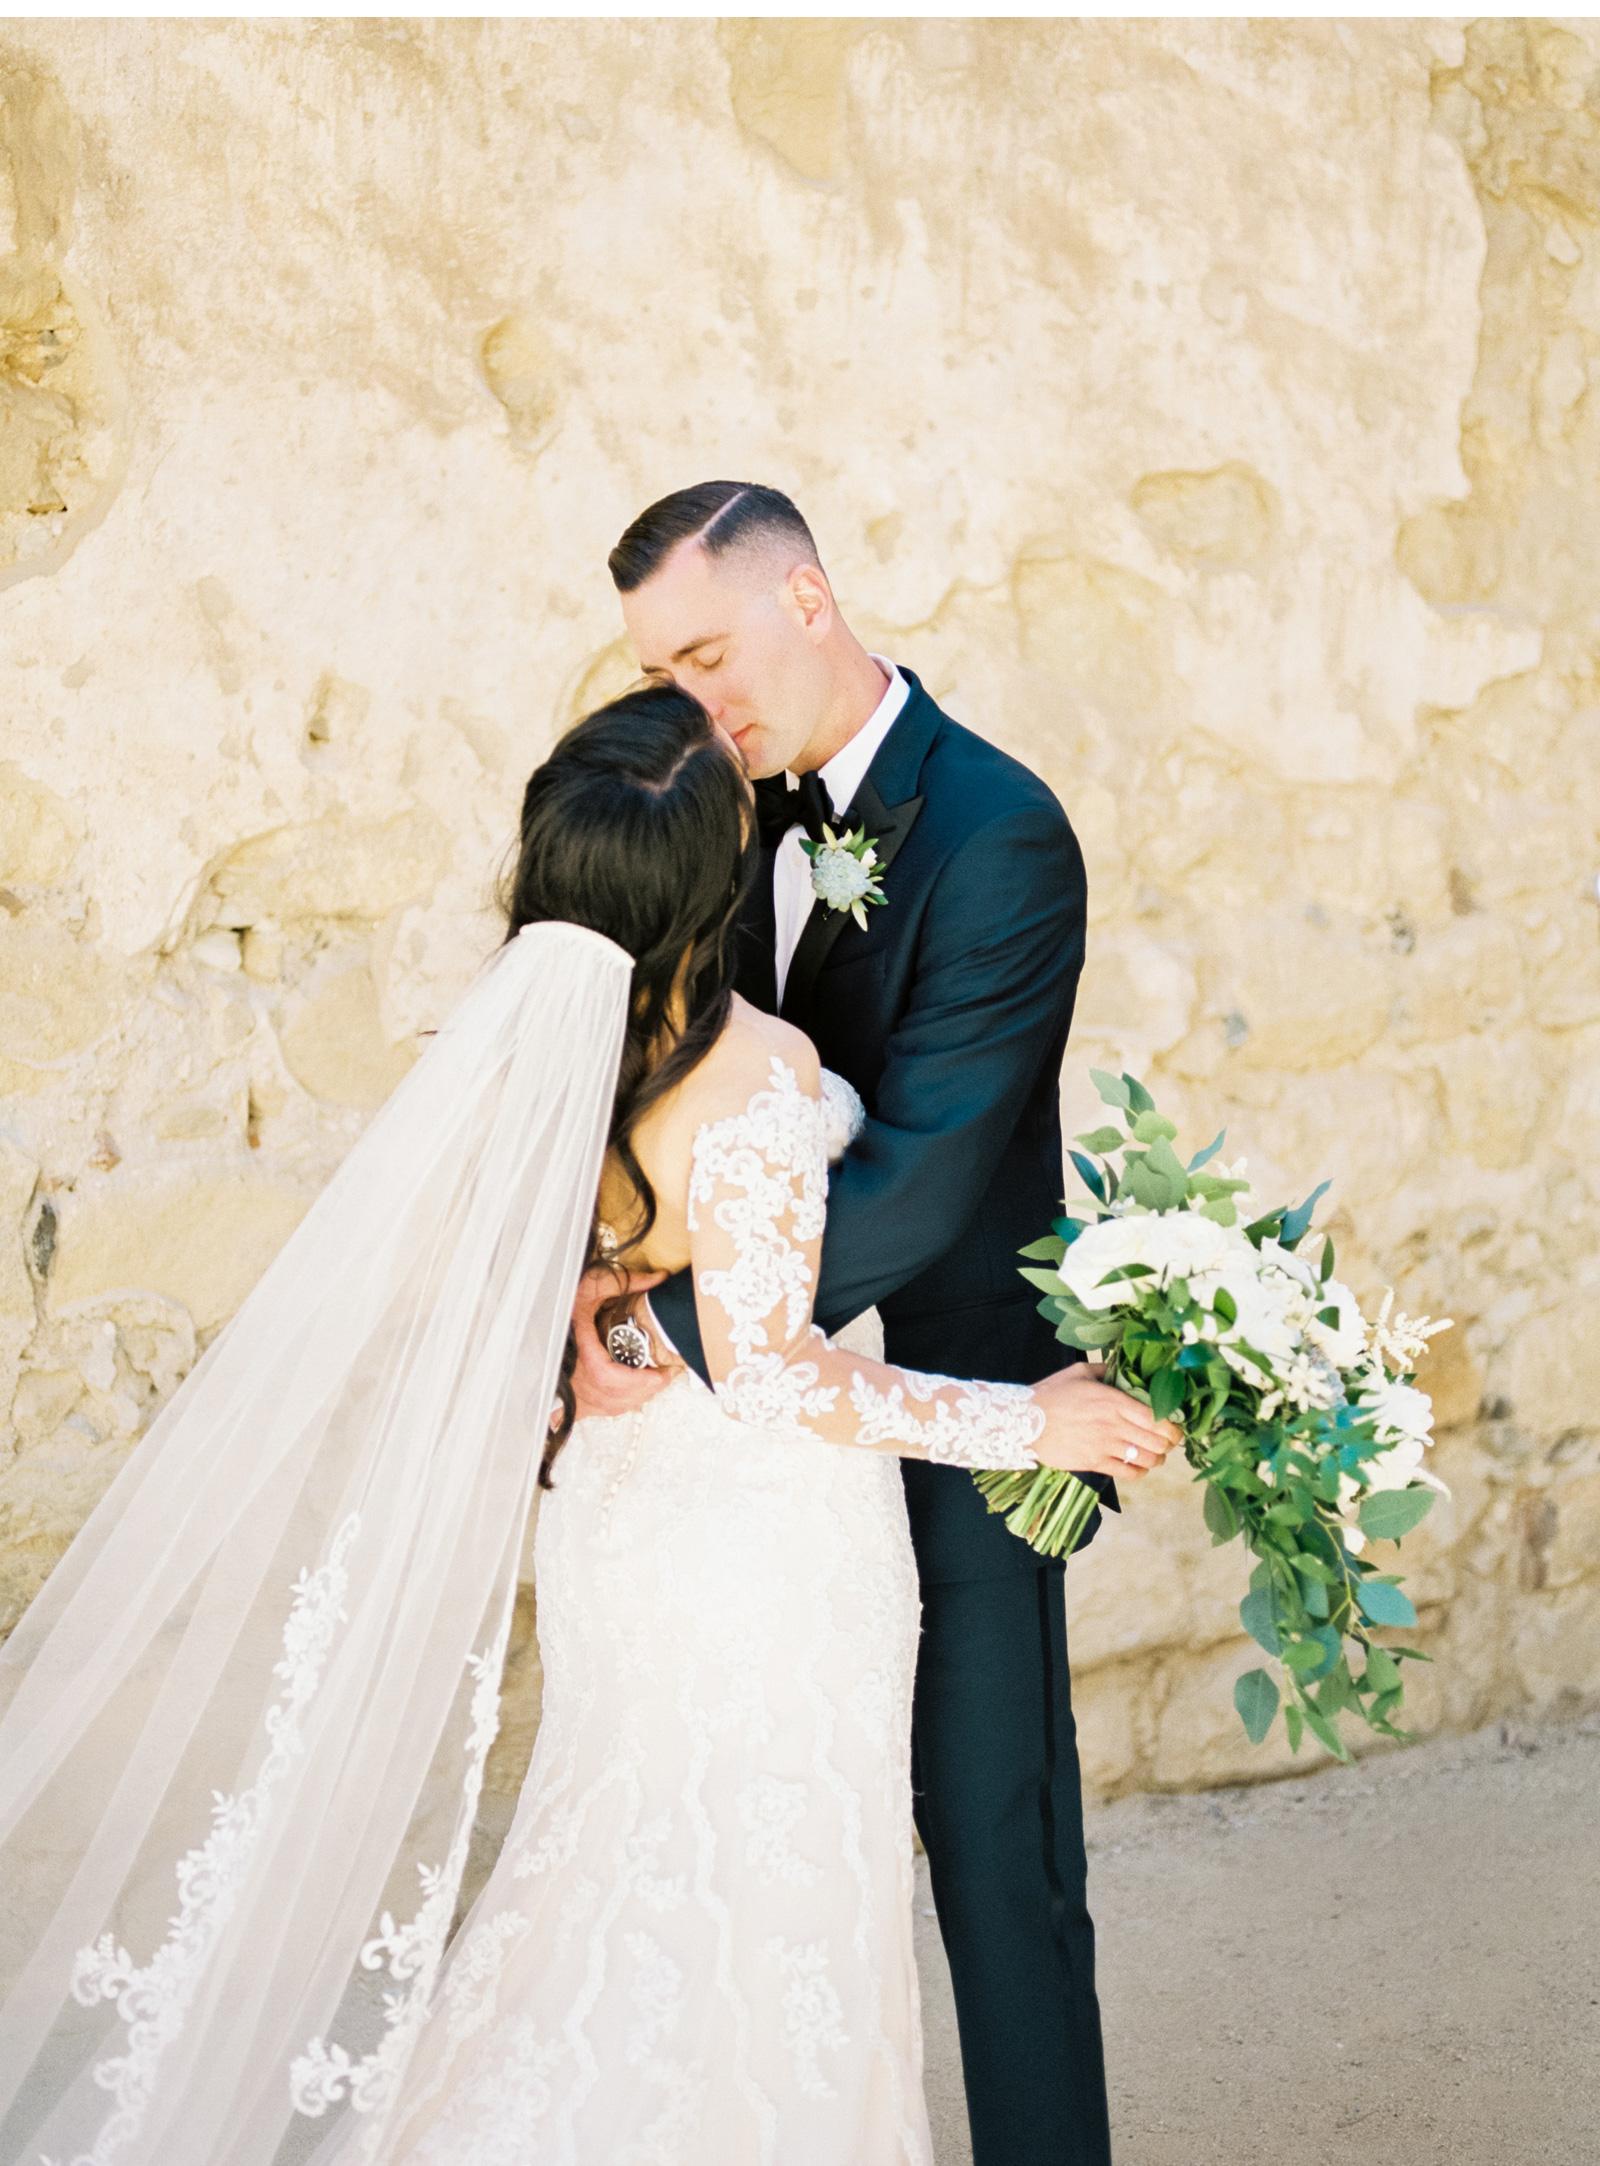 Southern-California-Weddings-Natalie-Schutt-Photography-Weddings_04.jpg